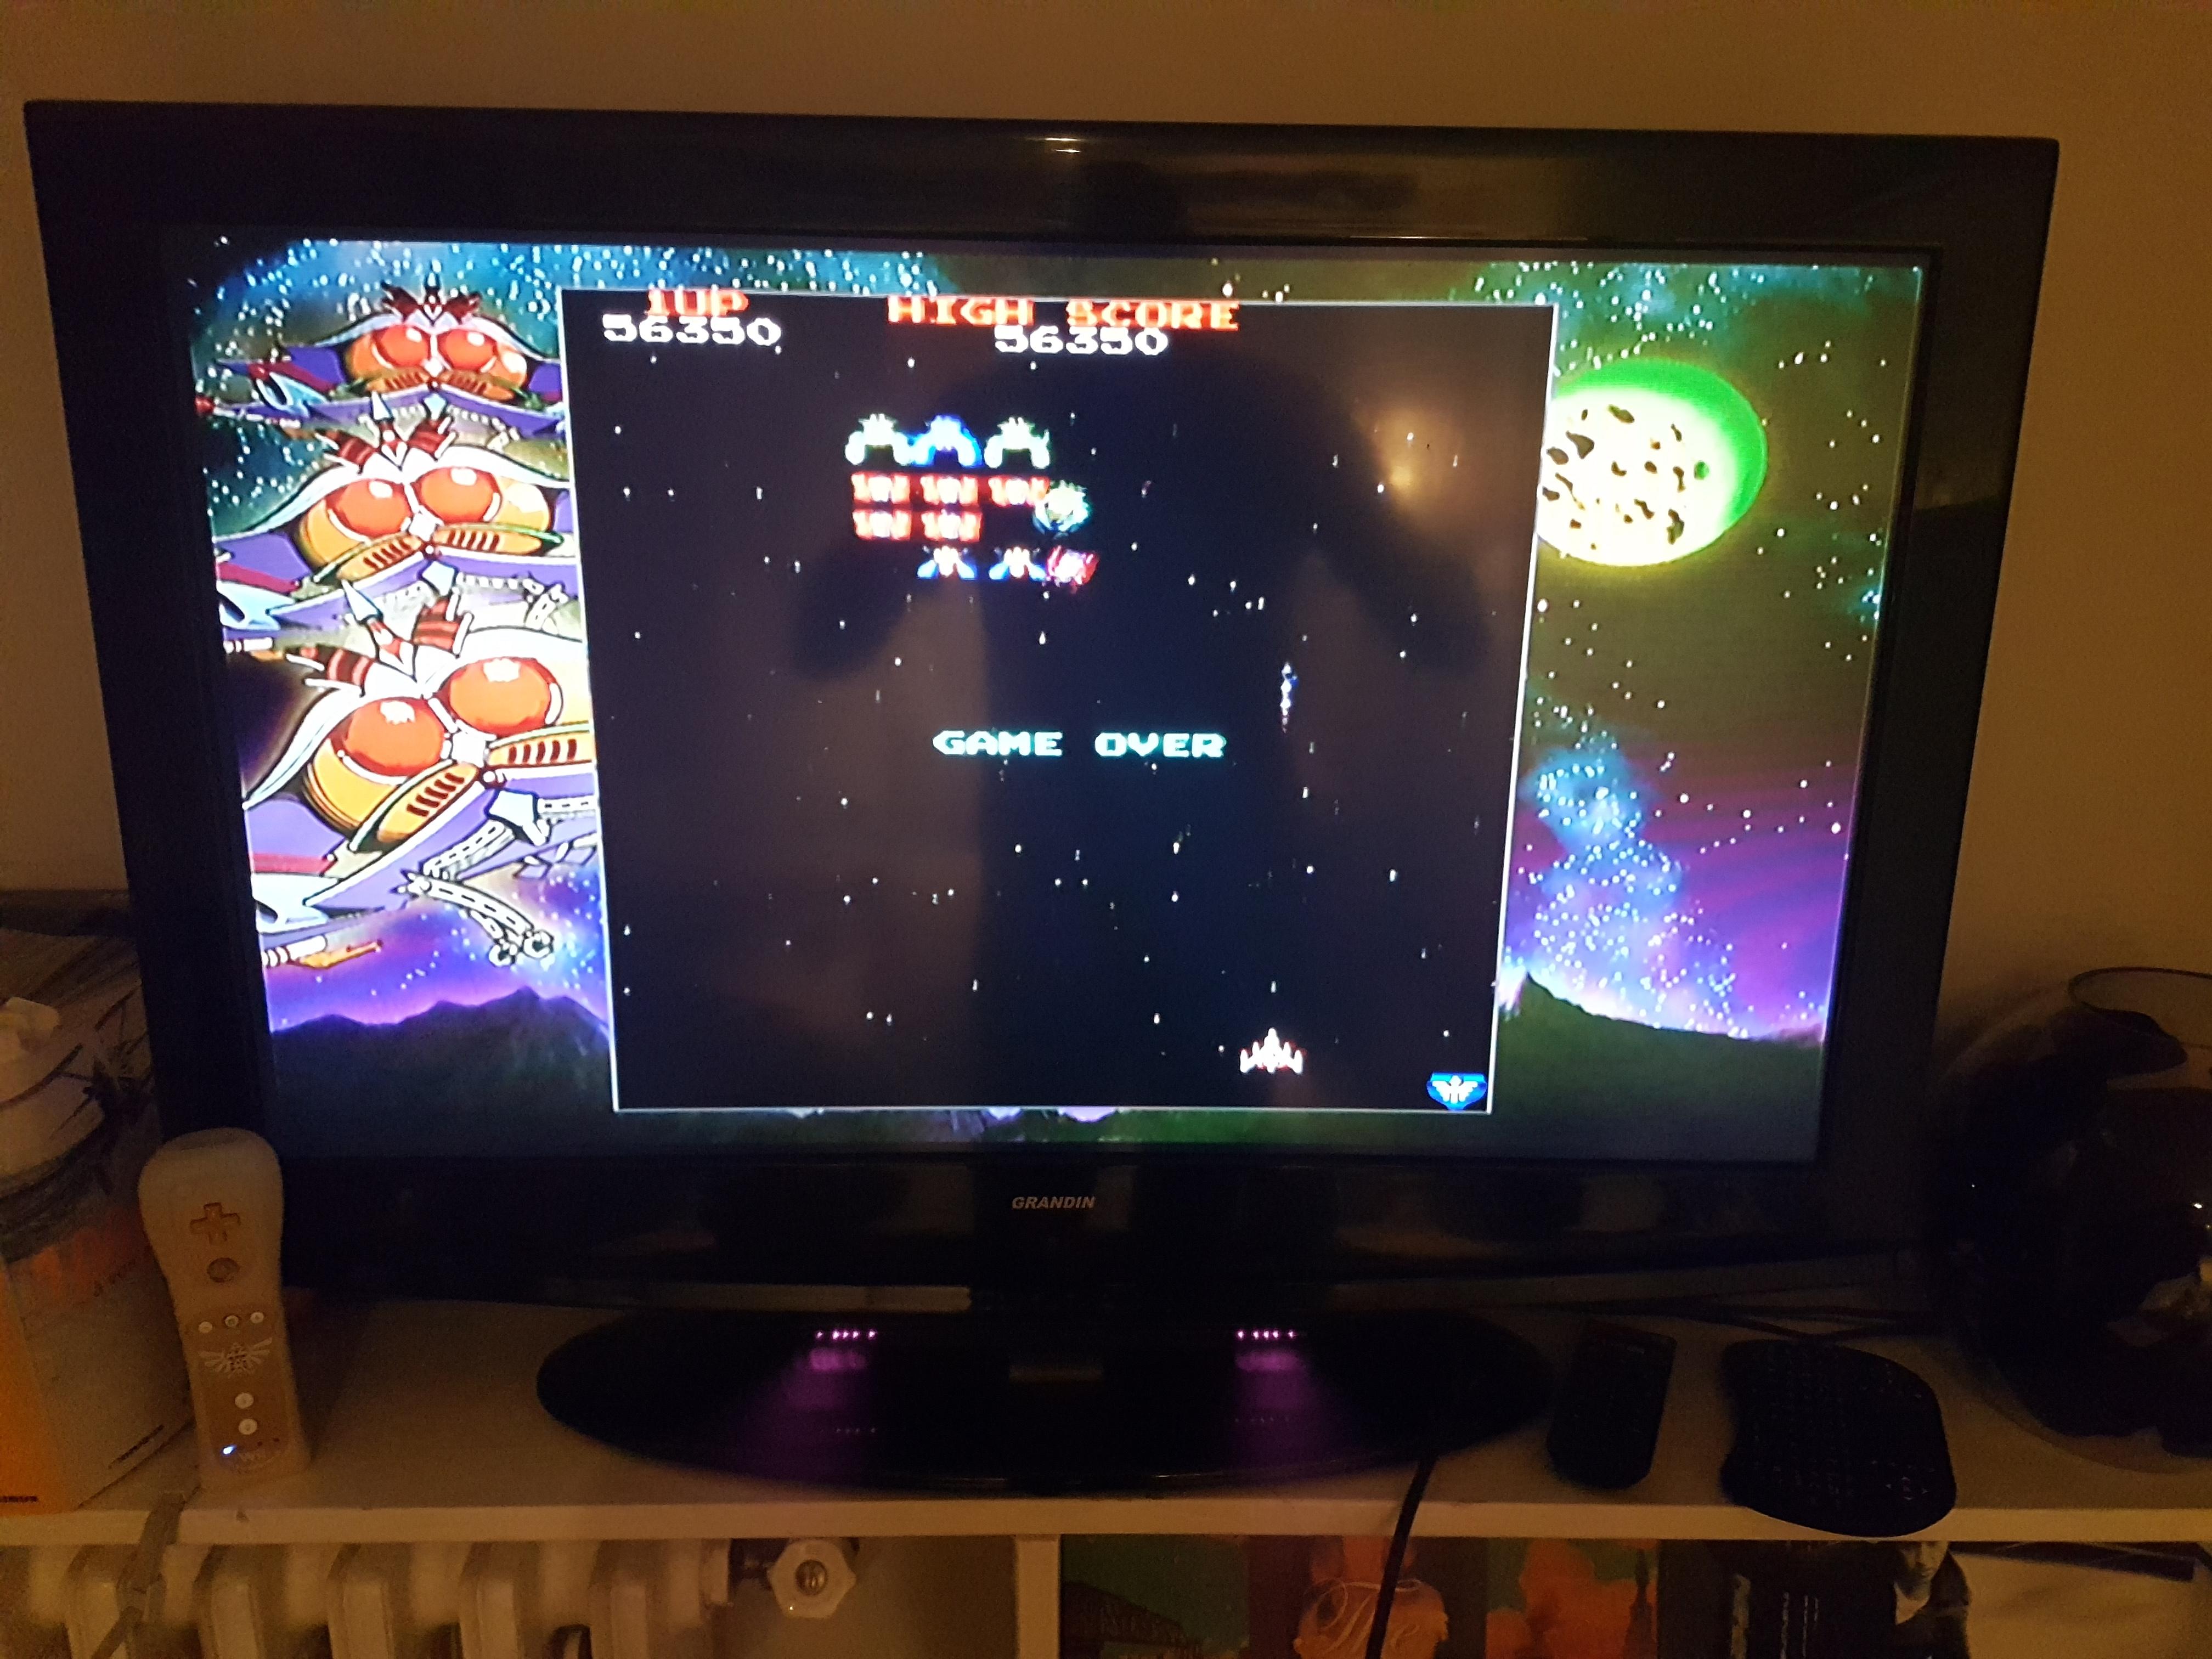 Namco Museum Megamix: Galaga 56,350 points